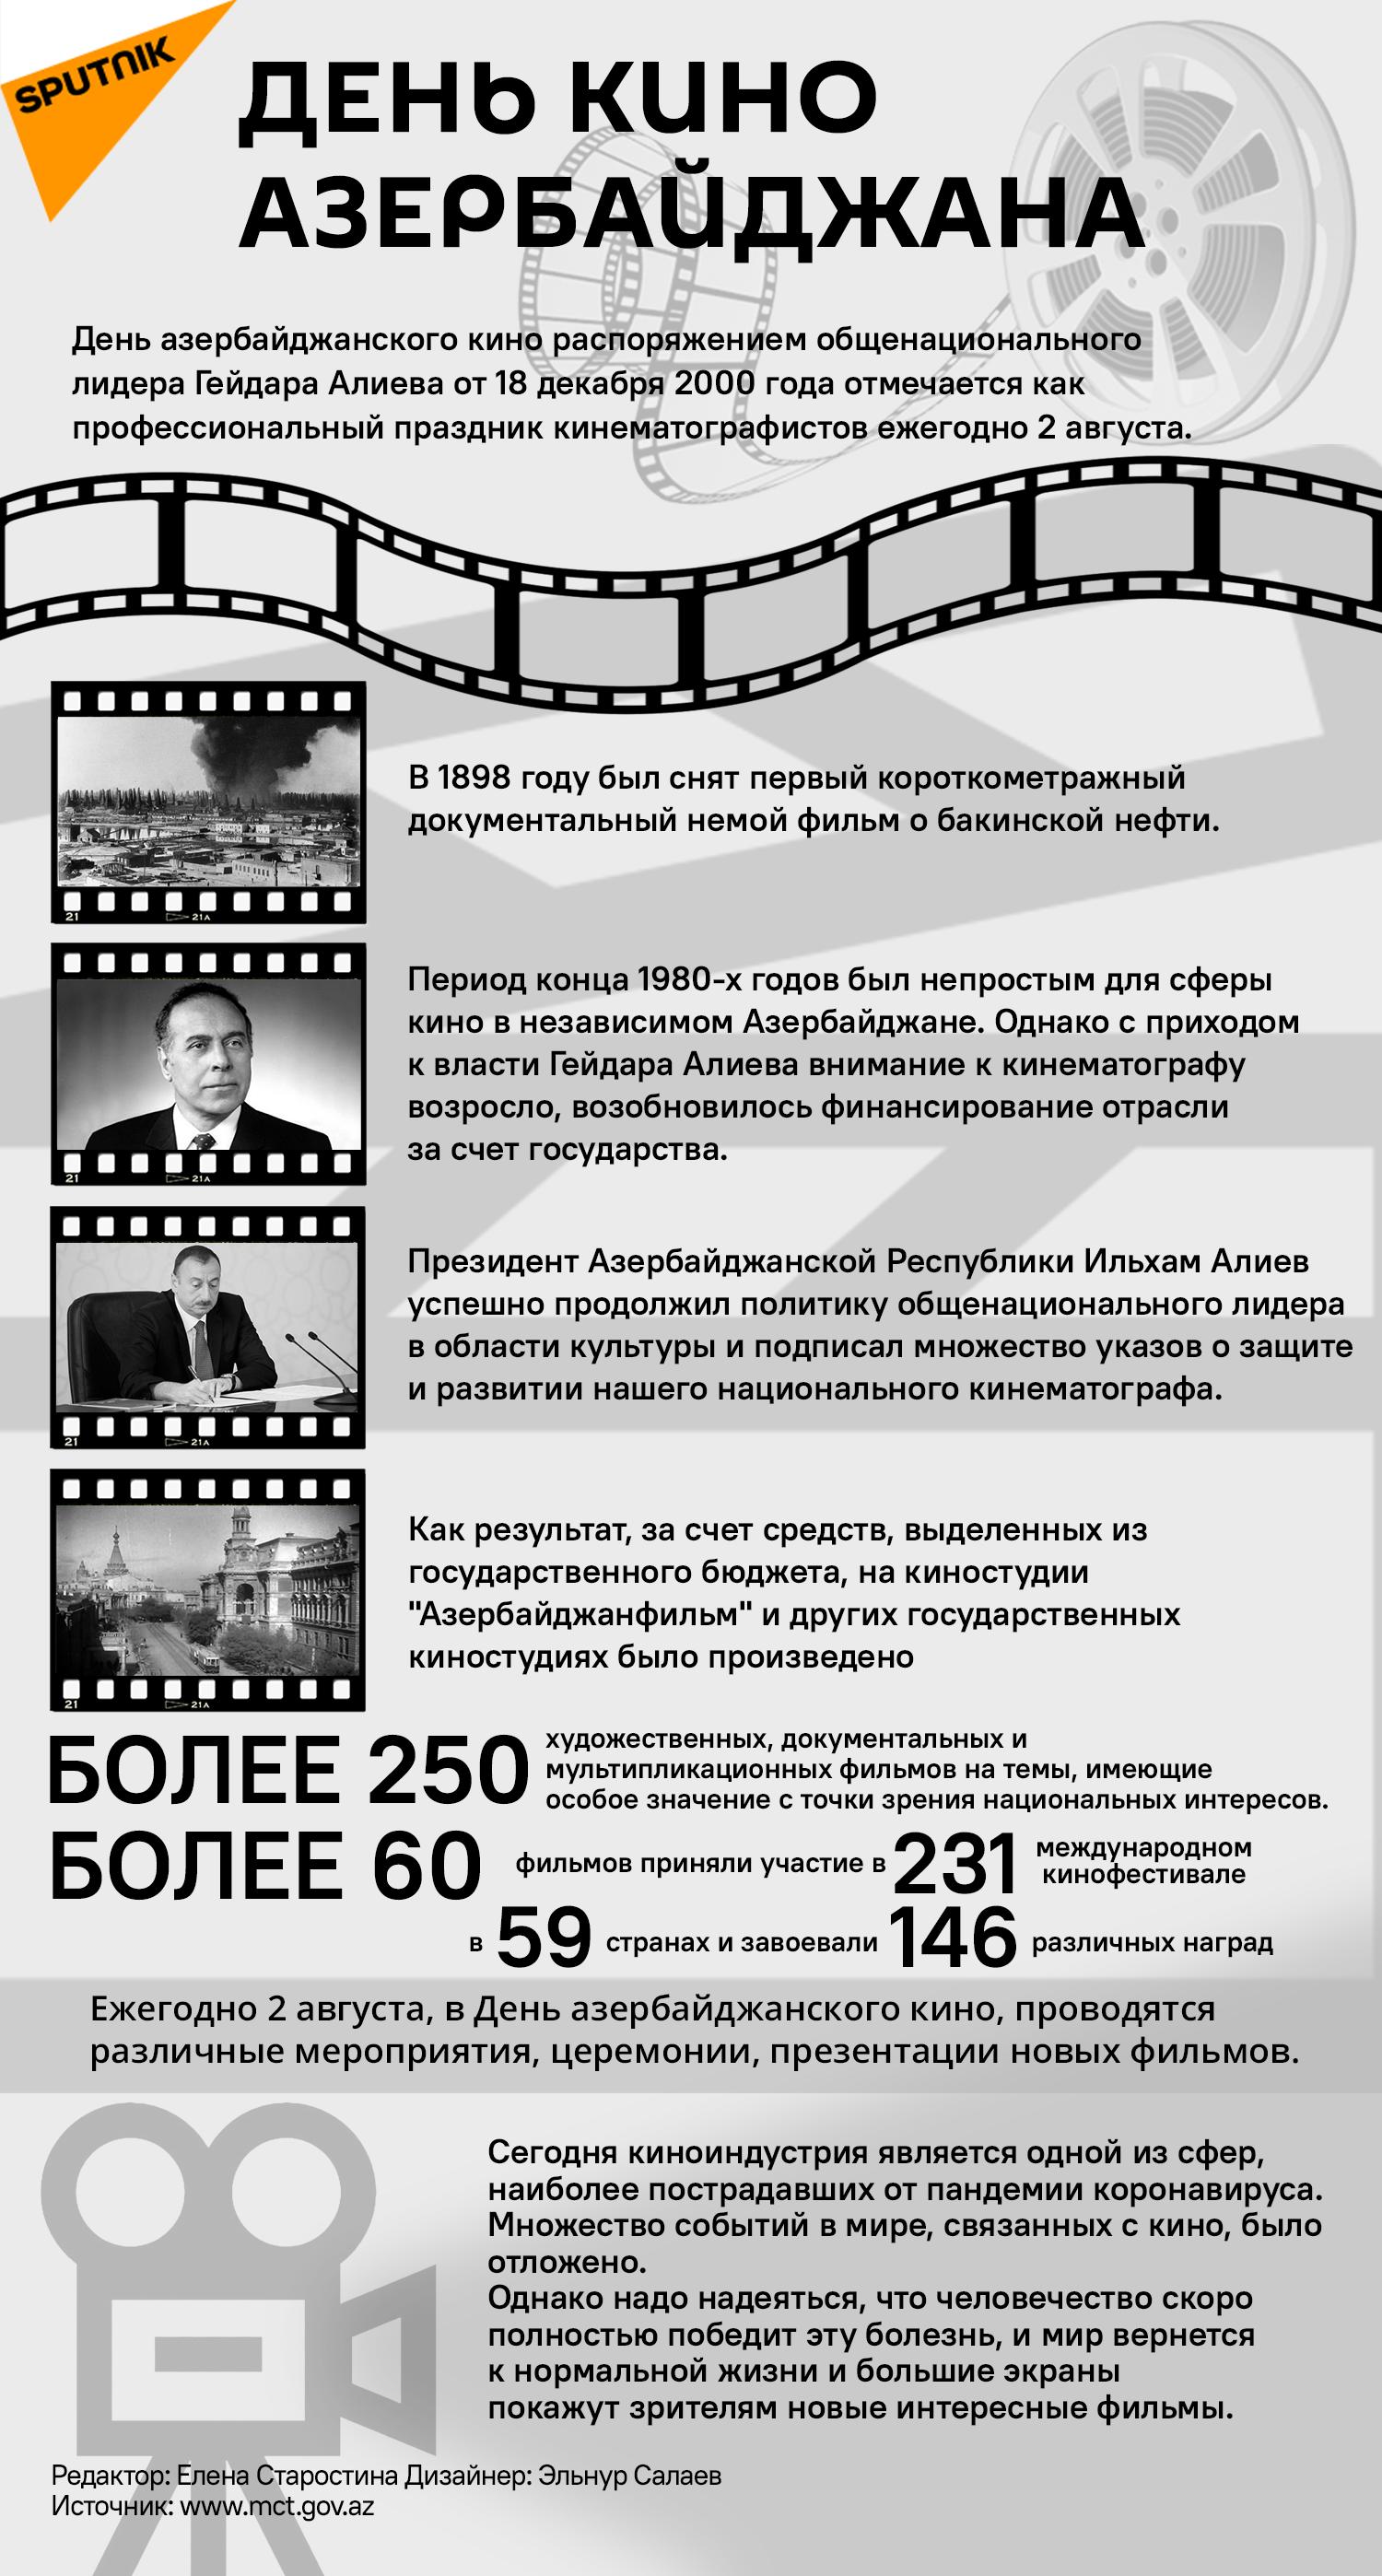 Инфографика: День кино Азербайджана - Sputnik Азербайджан, 1920, 02.08.2021